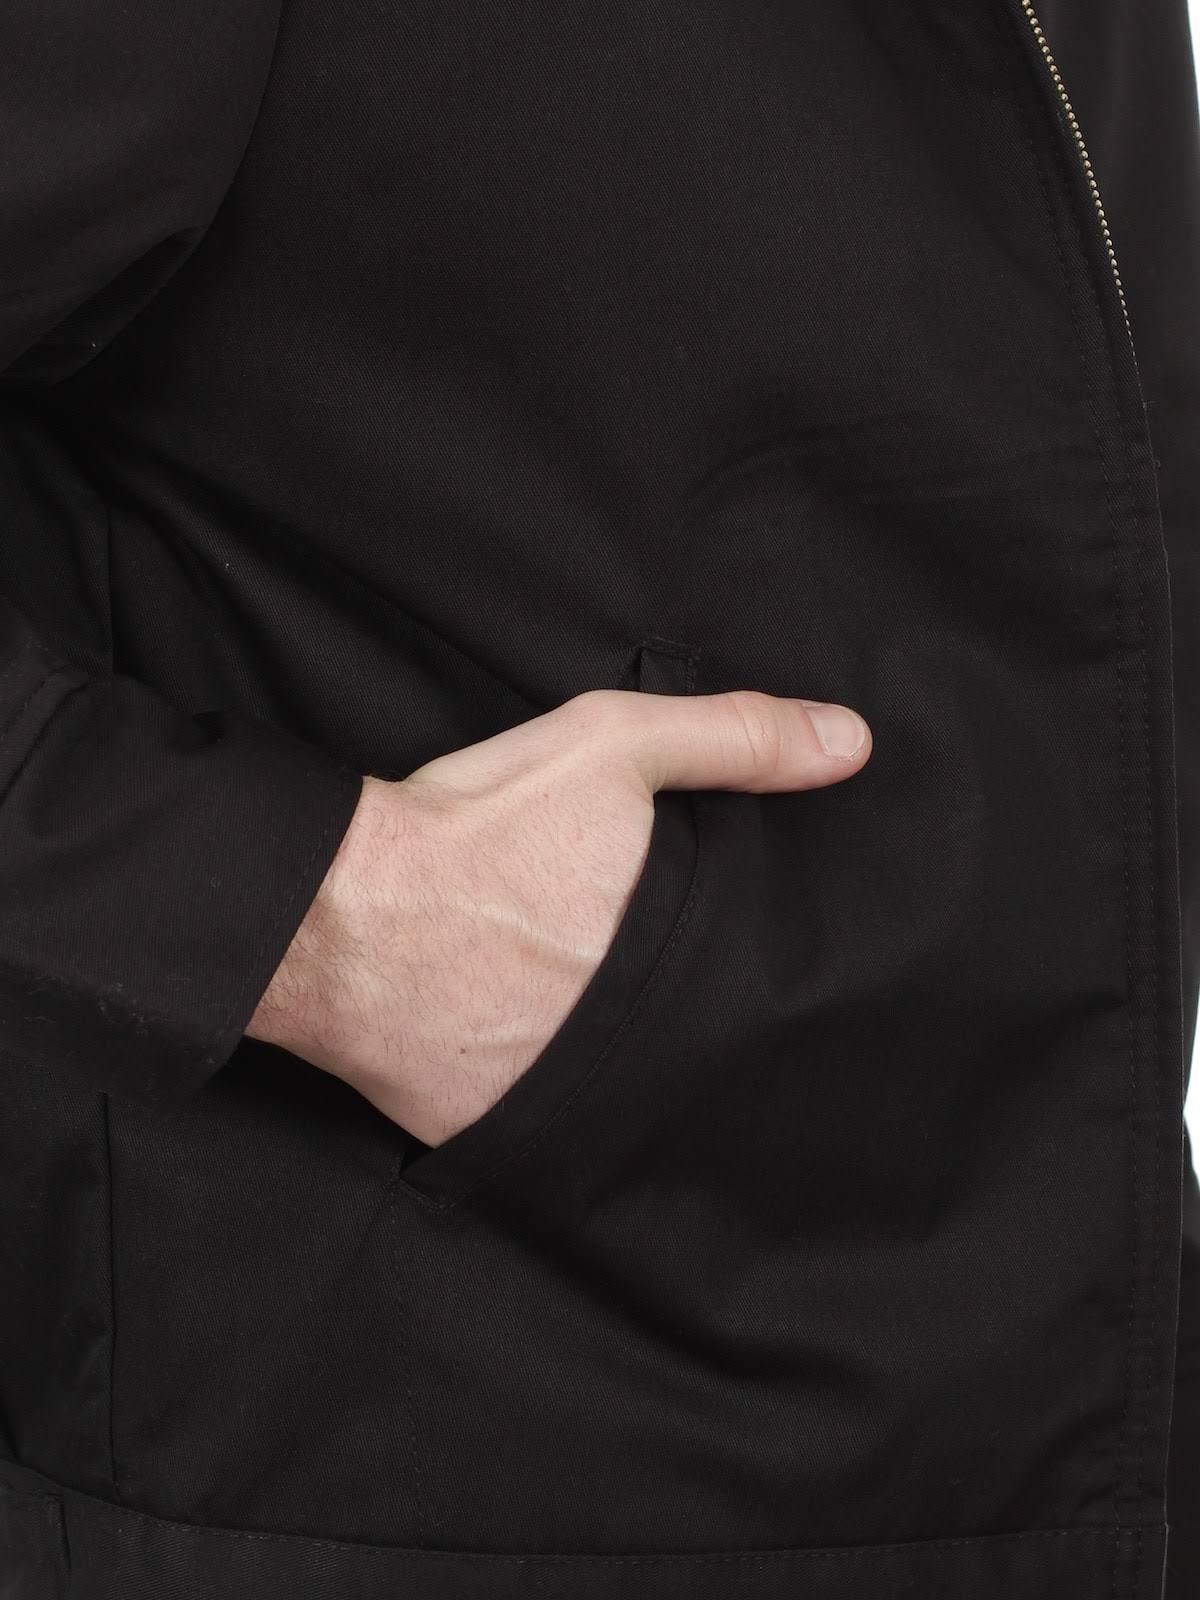 Schwarz Eisenhower Männer M Gefütterte Oz Dickies Jacke 8 Jt15 0wqxXC